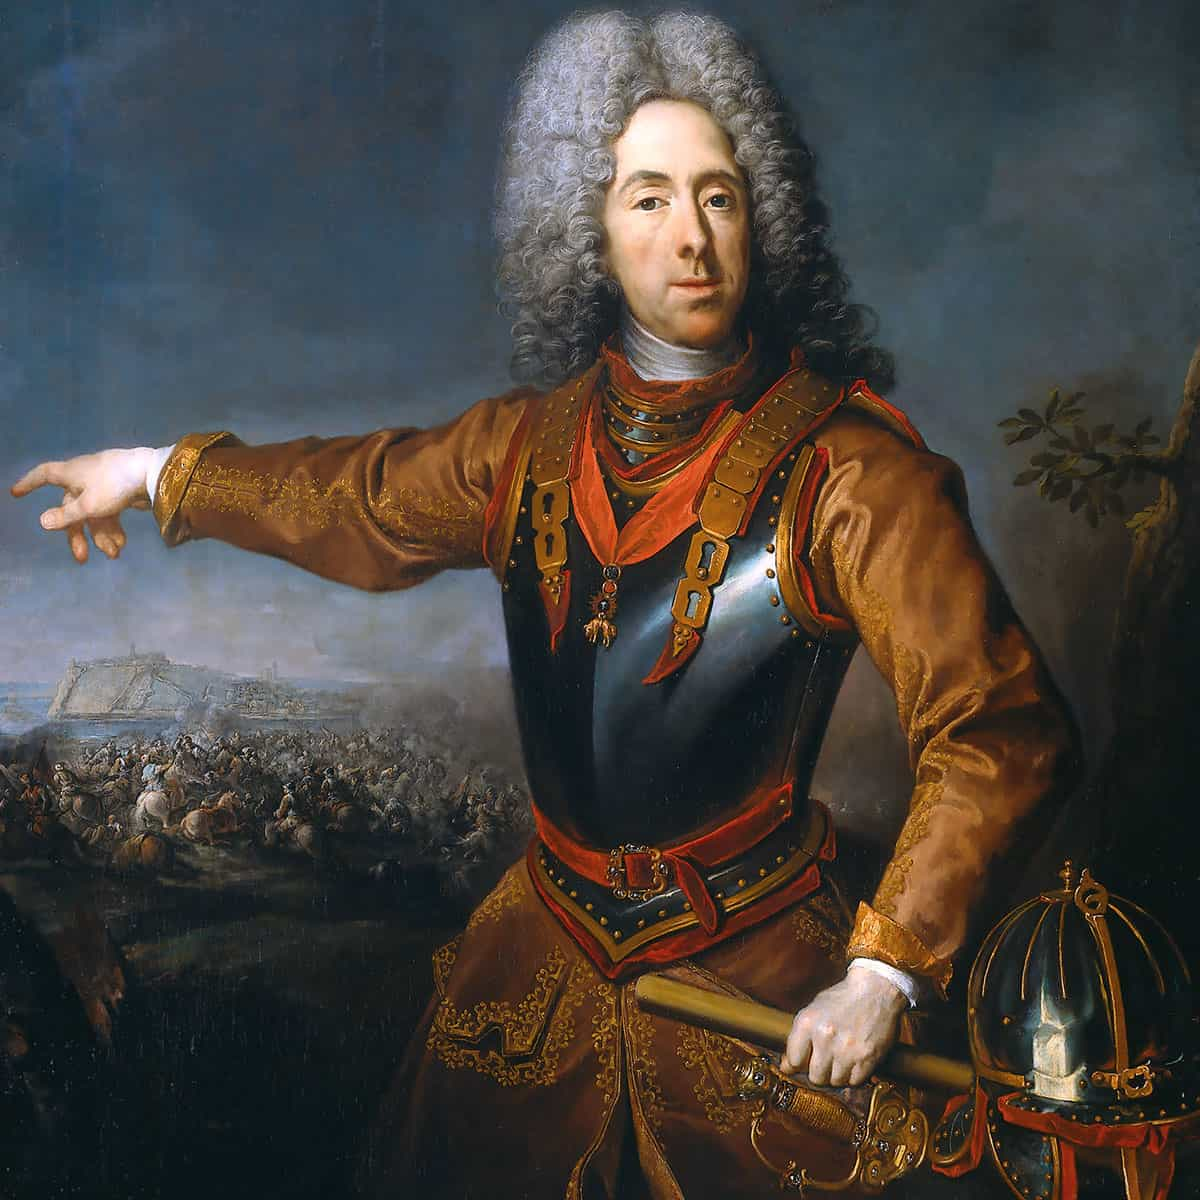 Eugen Savojski